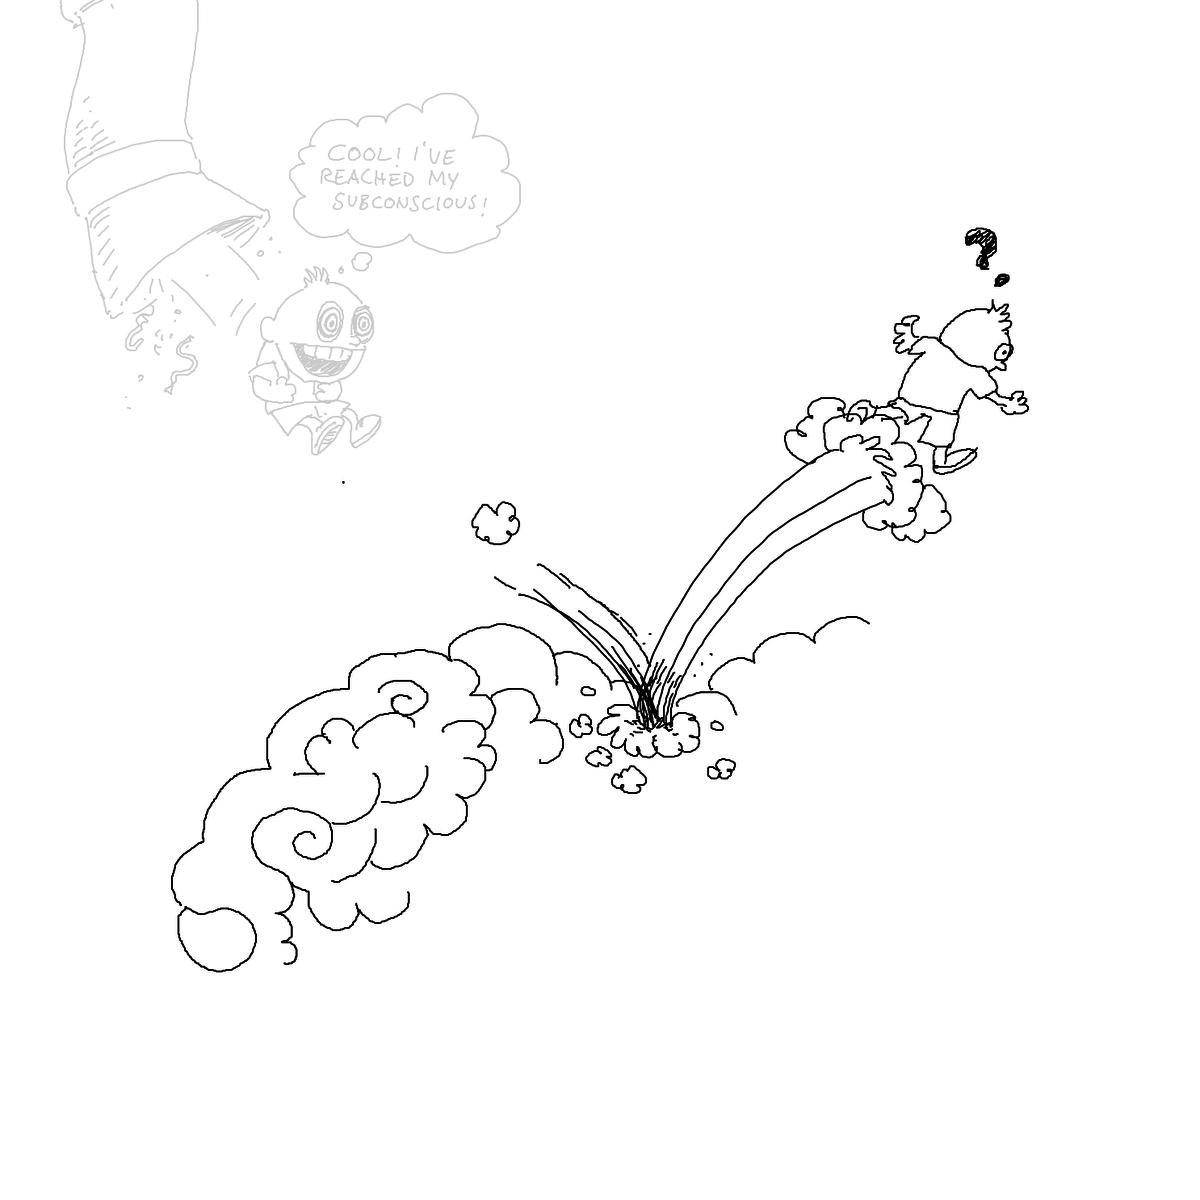 BAAAM drawing#22145 lat:78.4192199707031200lng: -4.4738578796386720